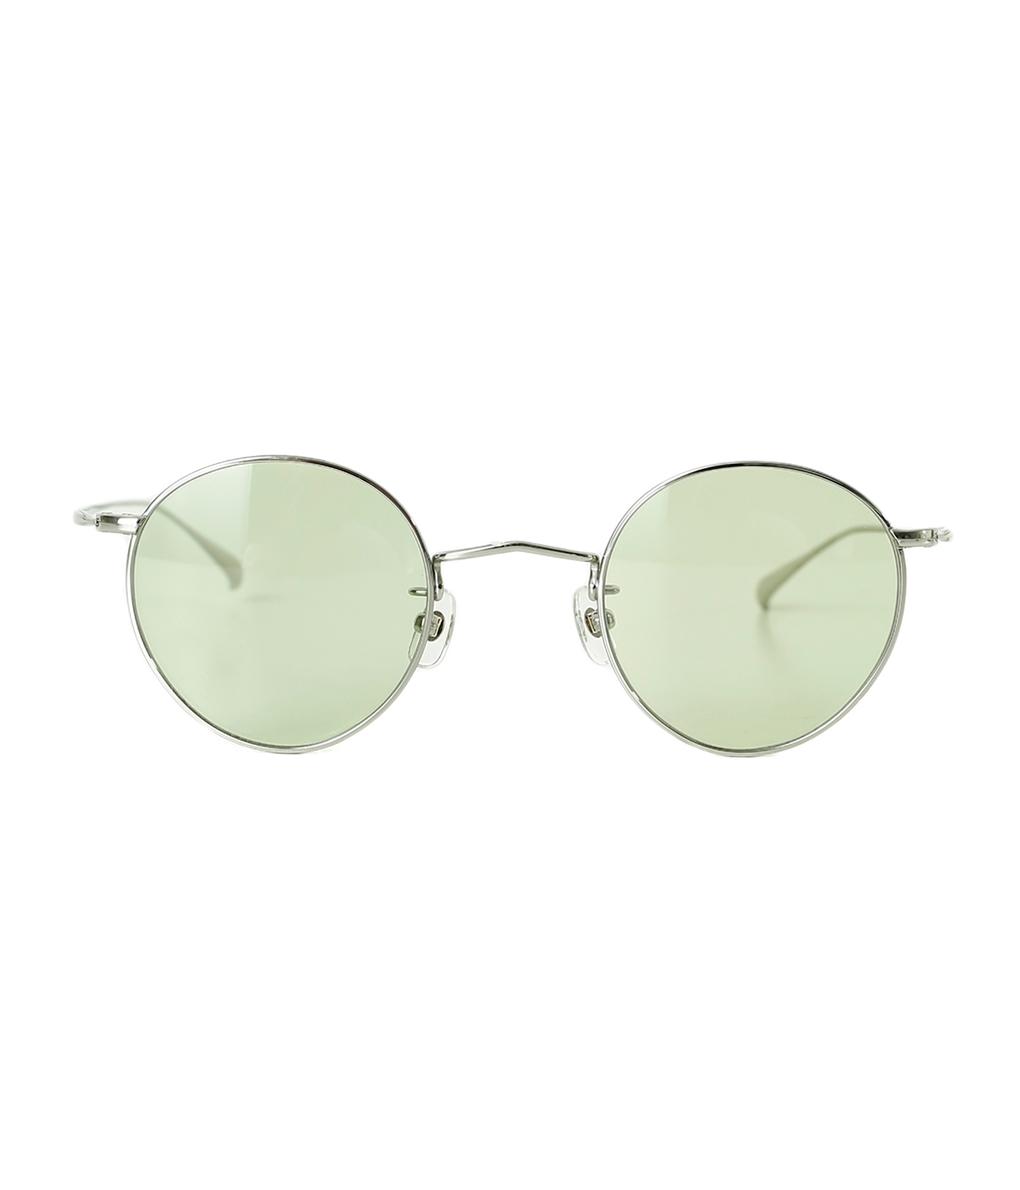 EFFECTOR / エフェクター : Equalizer / : メガネ 眼鏡 サングラス : EQUALIZER-wis【WIS】